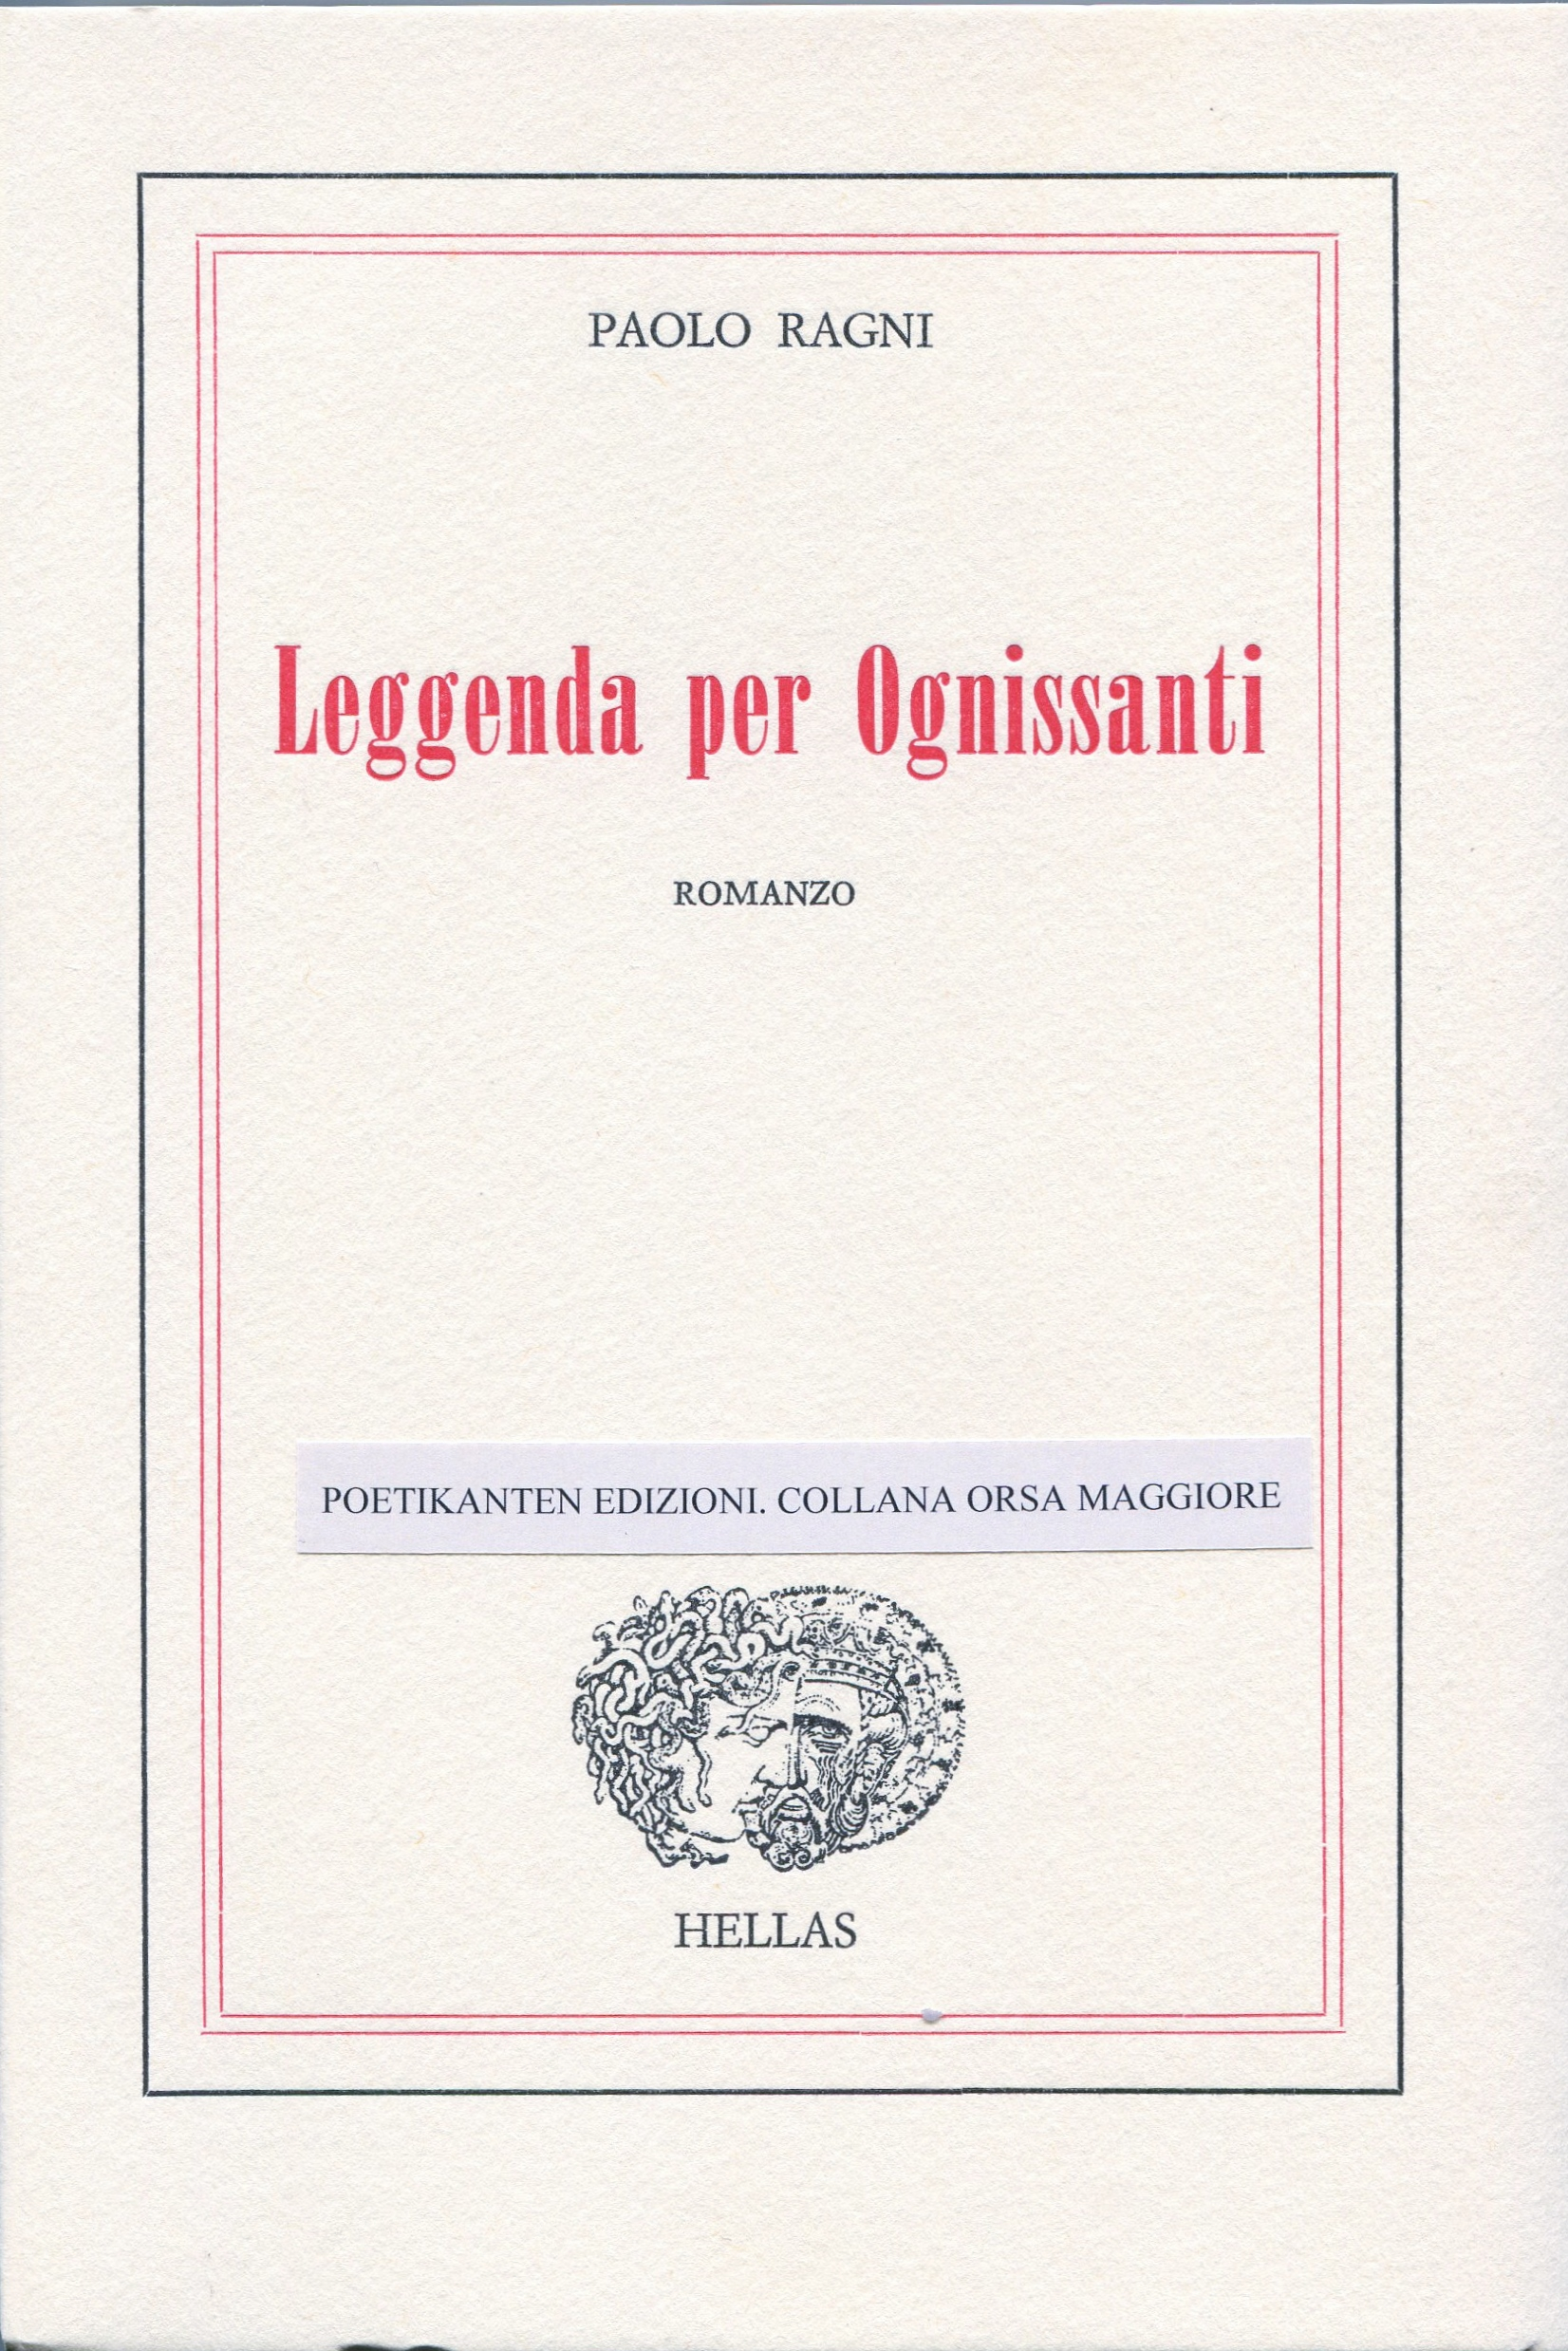 Copertina Nuova Leggenda per Ognissanti (2)